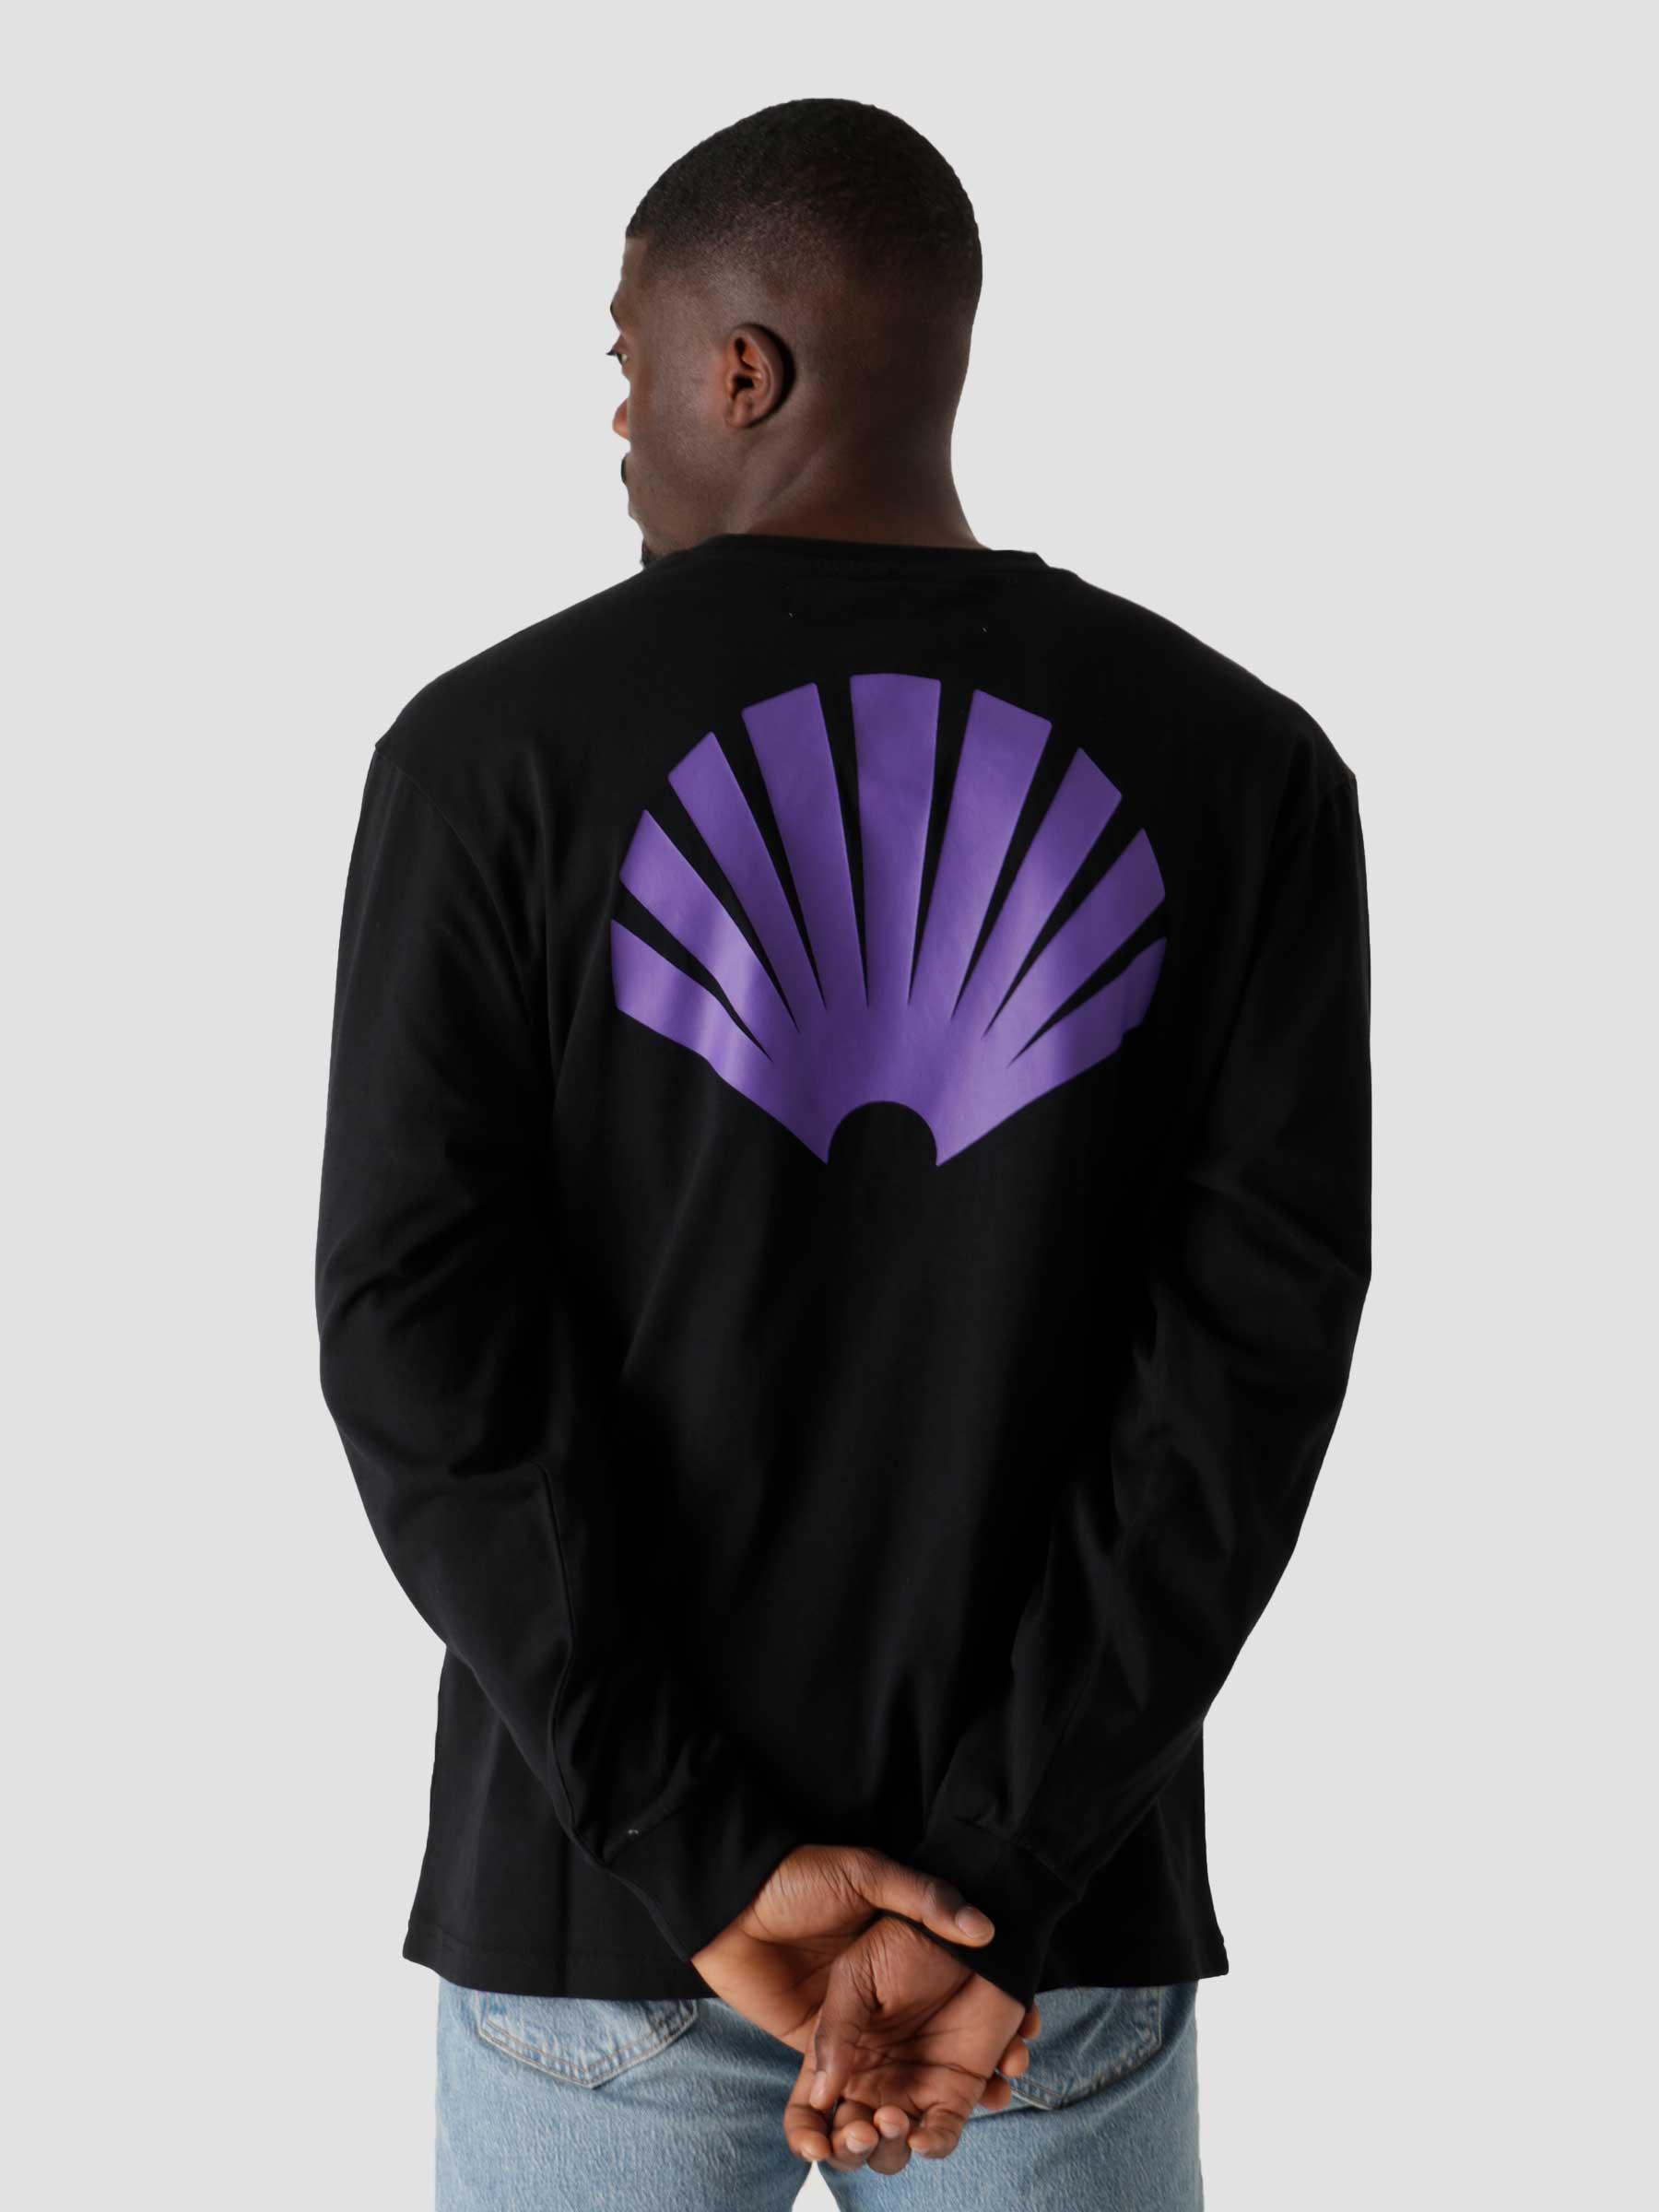 Logo Longsleeves Black Prism Violet 2021235